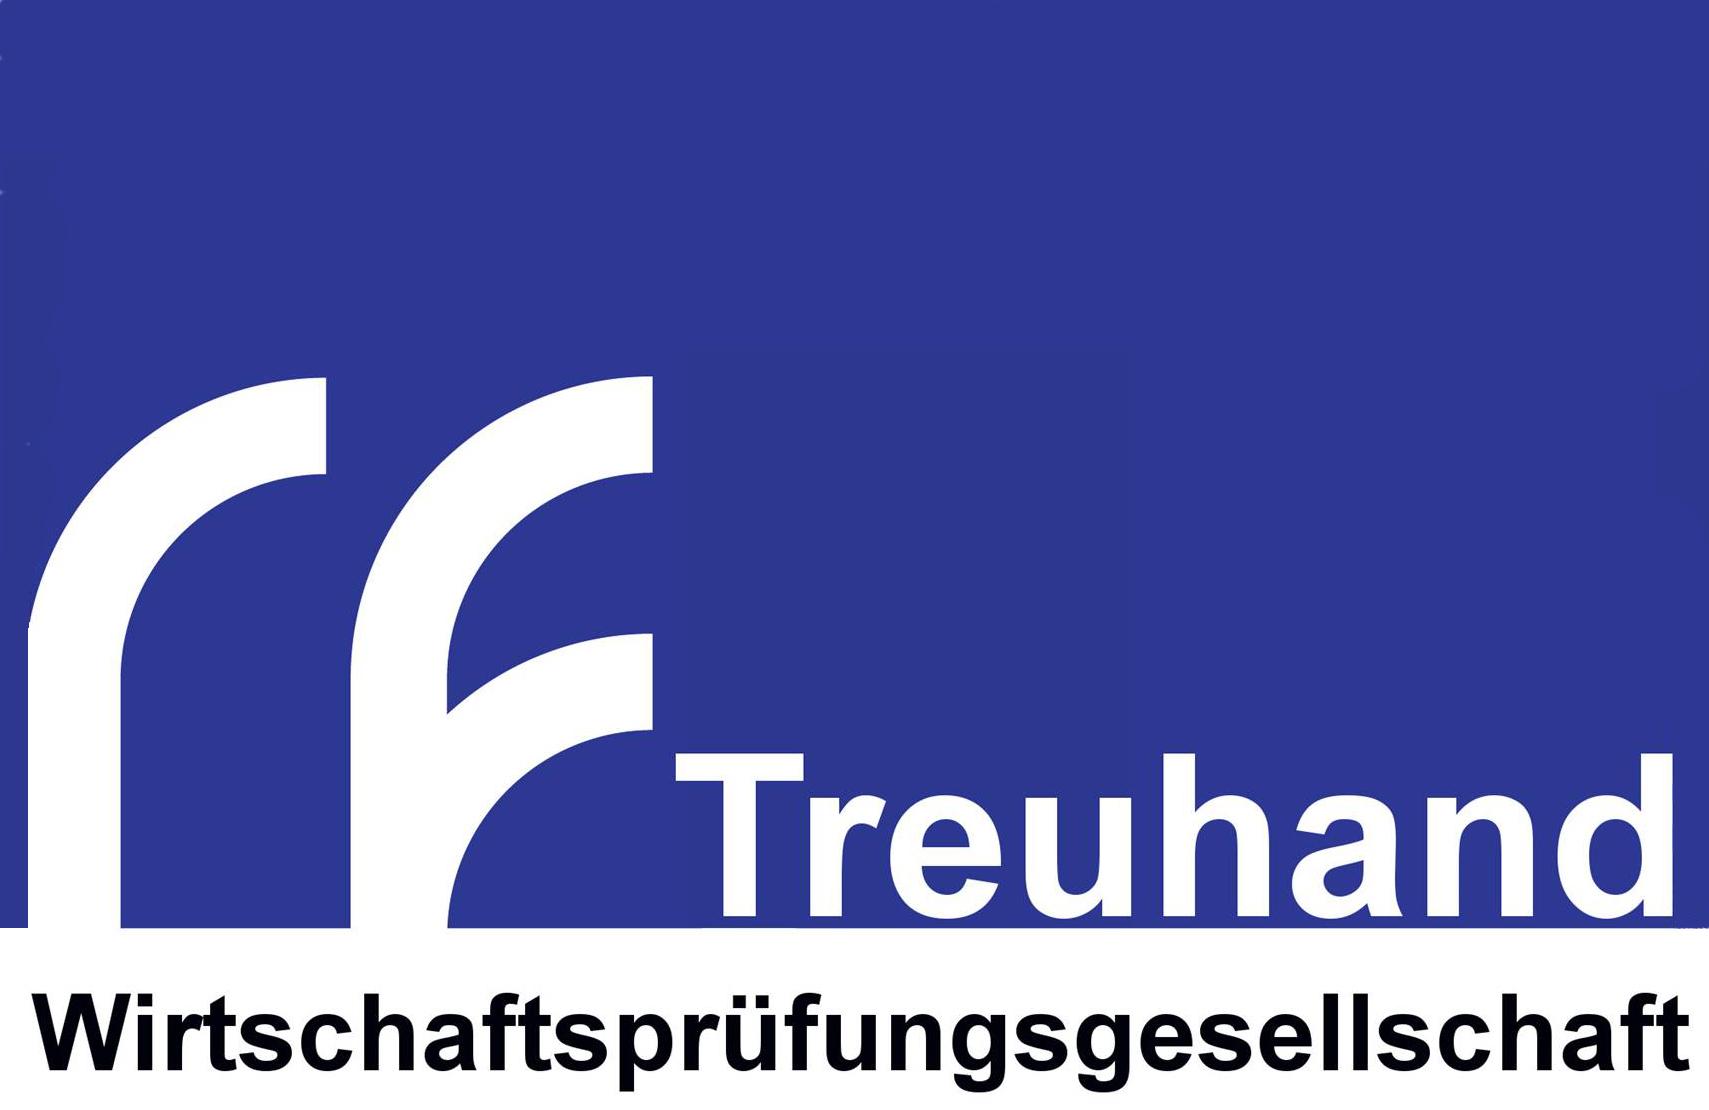 RF Treuhand GmbH